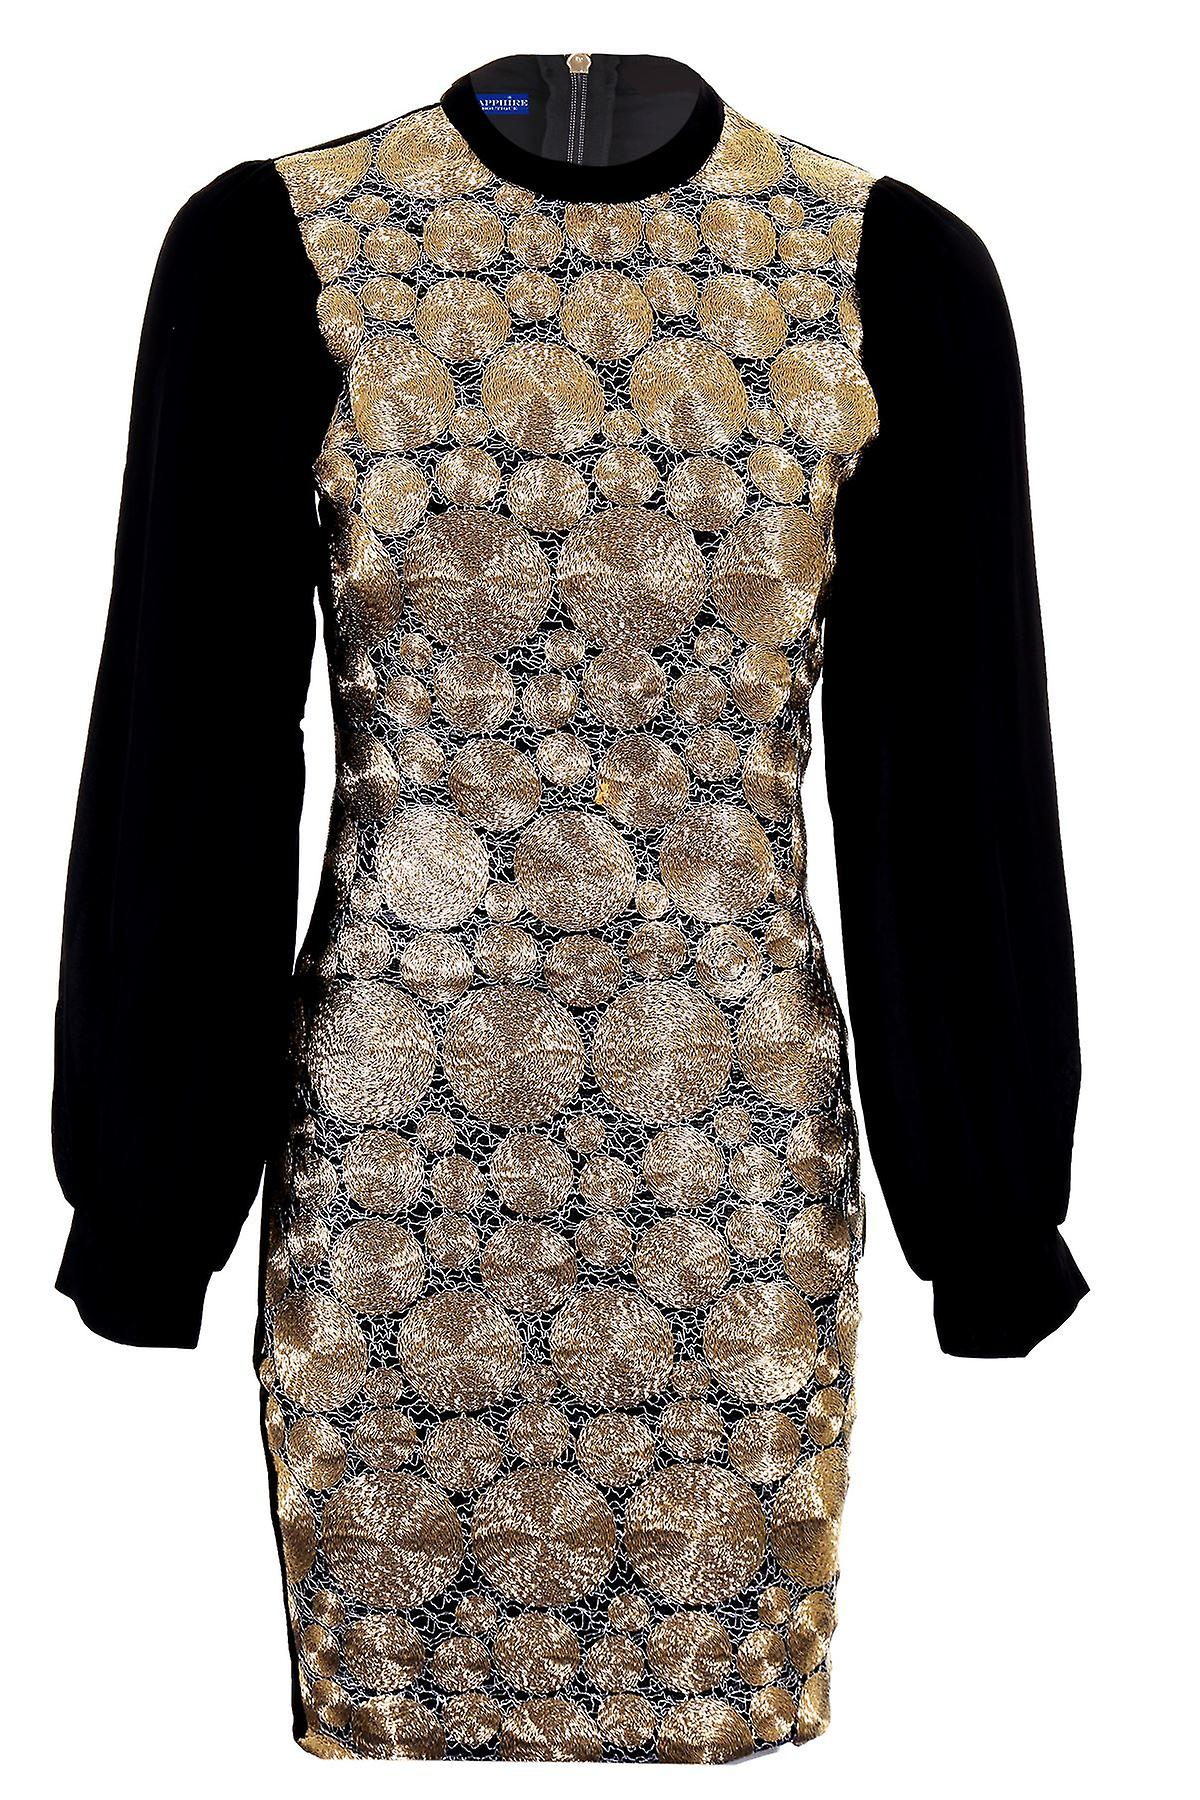 Ladies Chiffon Sleeve Gold Black Texture Wired Plain Back Bodycon Womens Dress